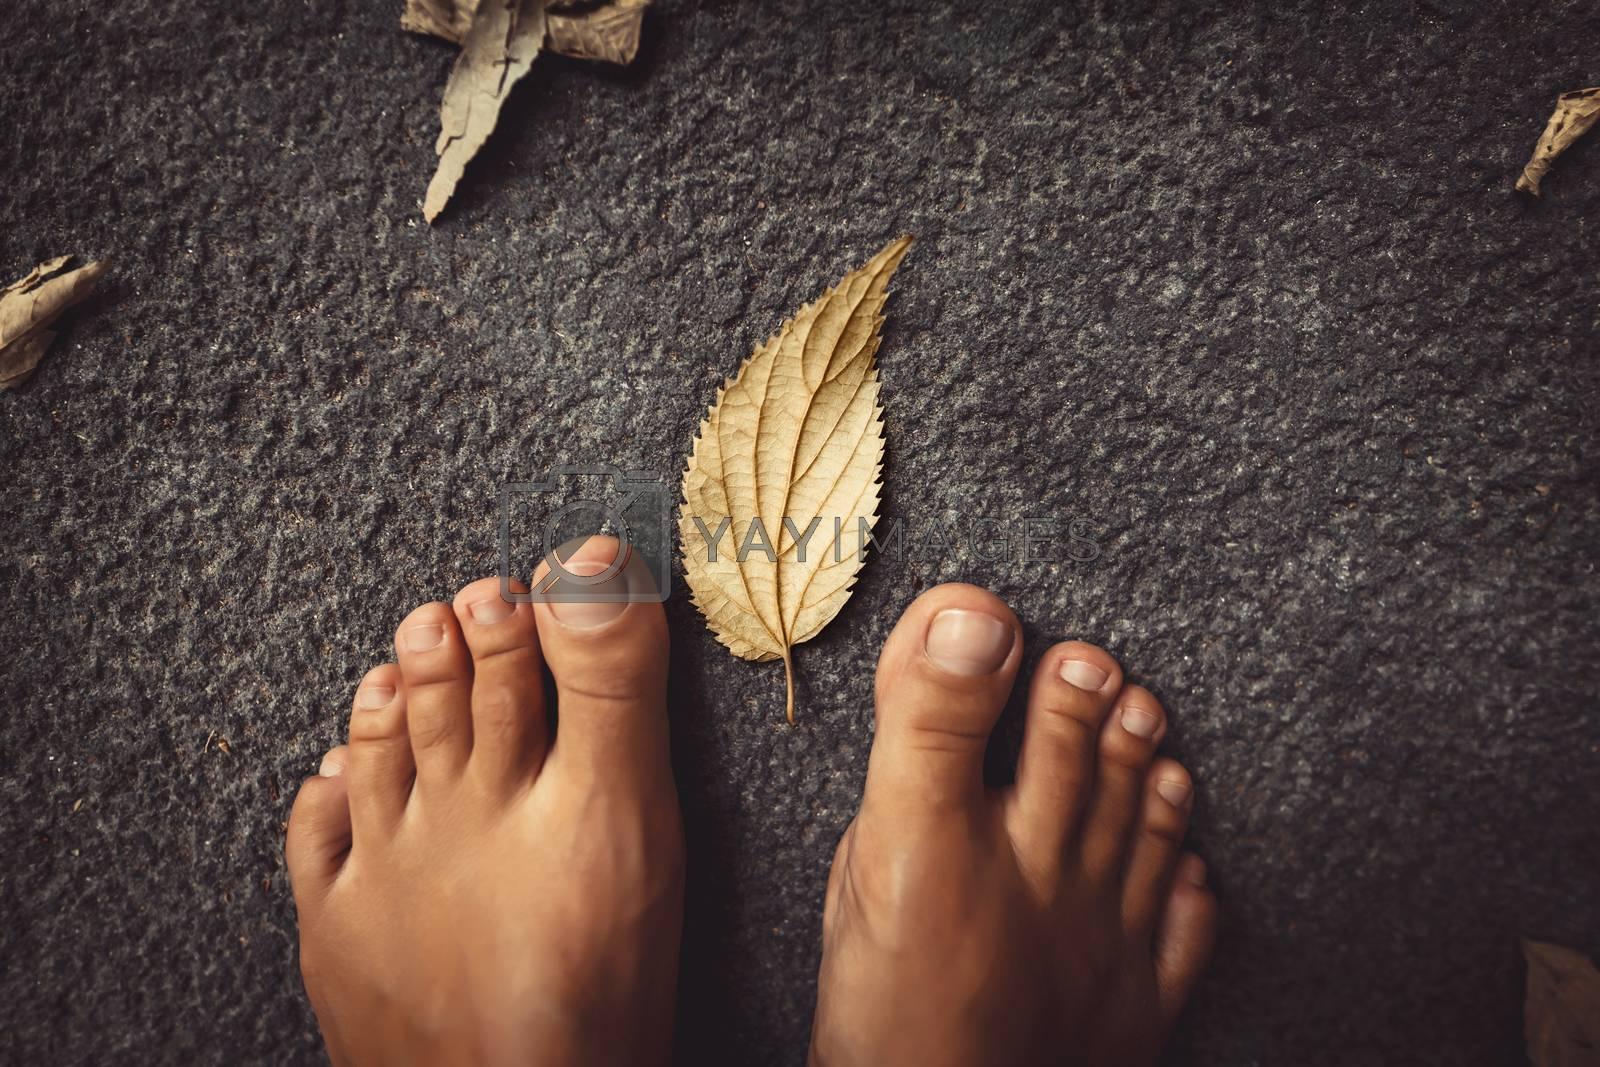 Fall Season Concept by Anna_Omelchenko